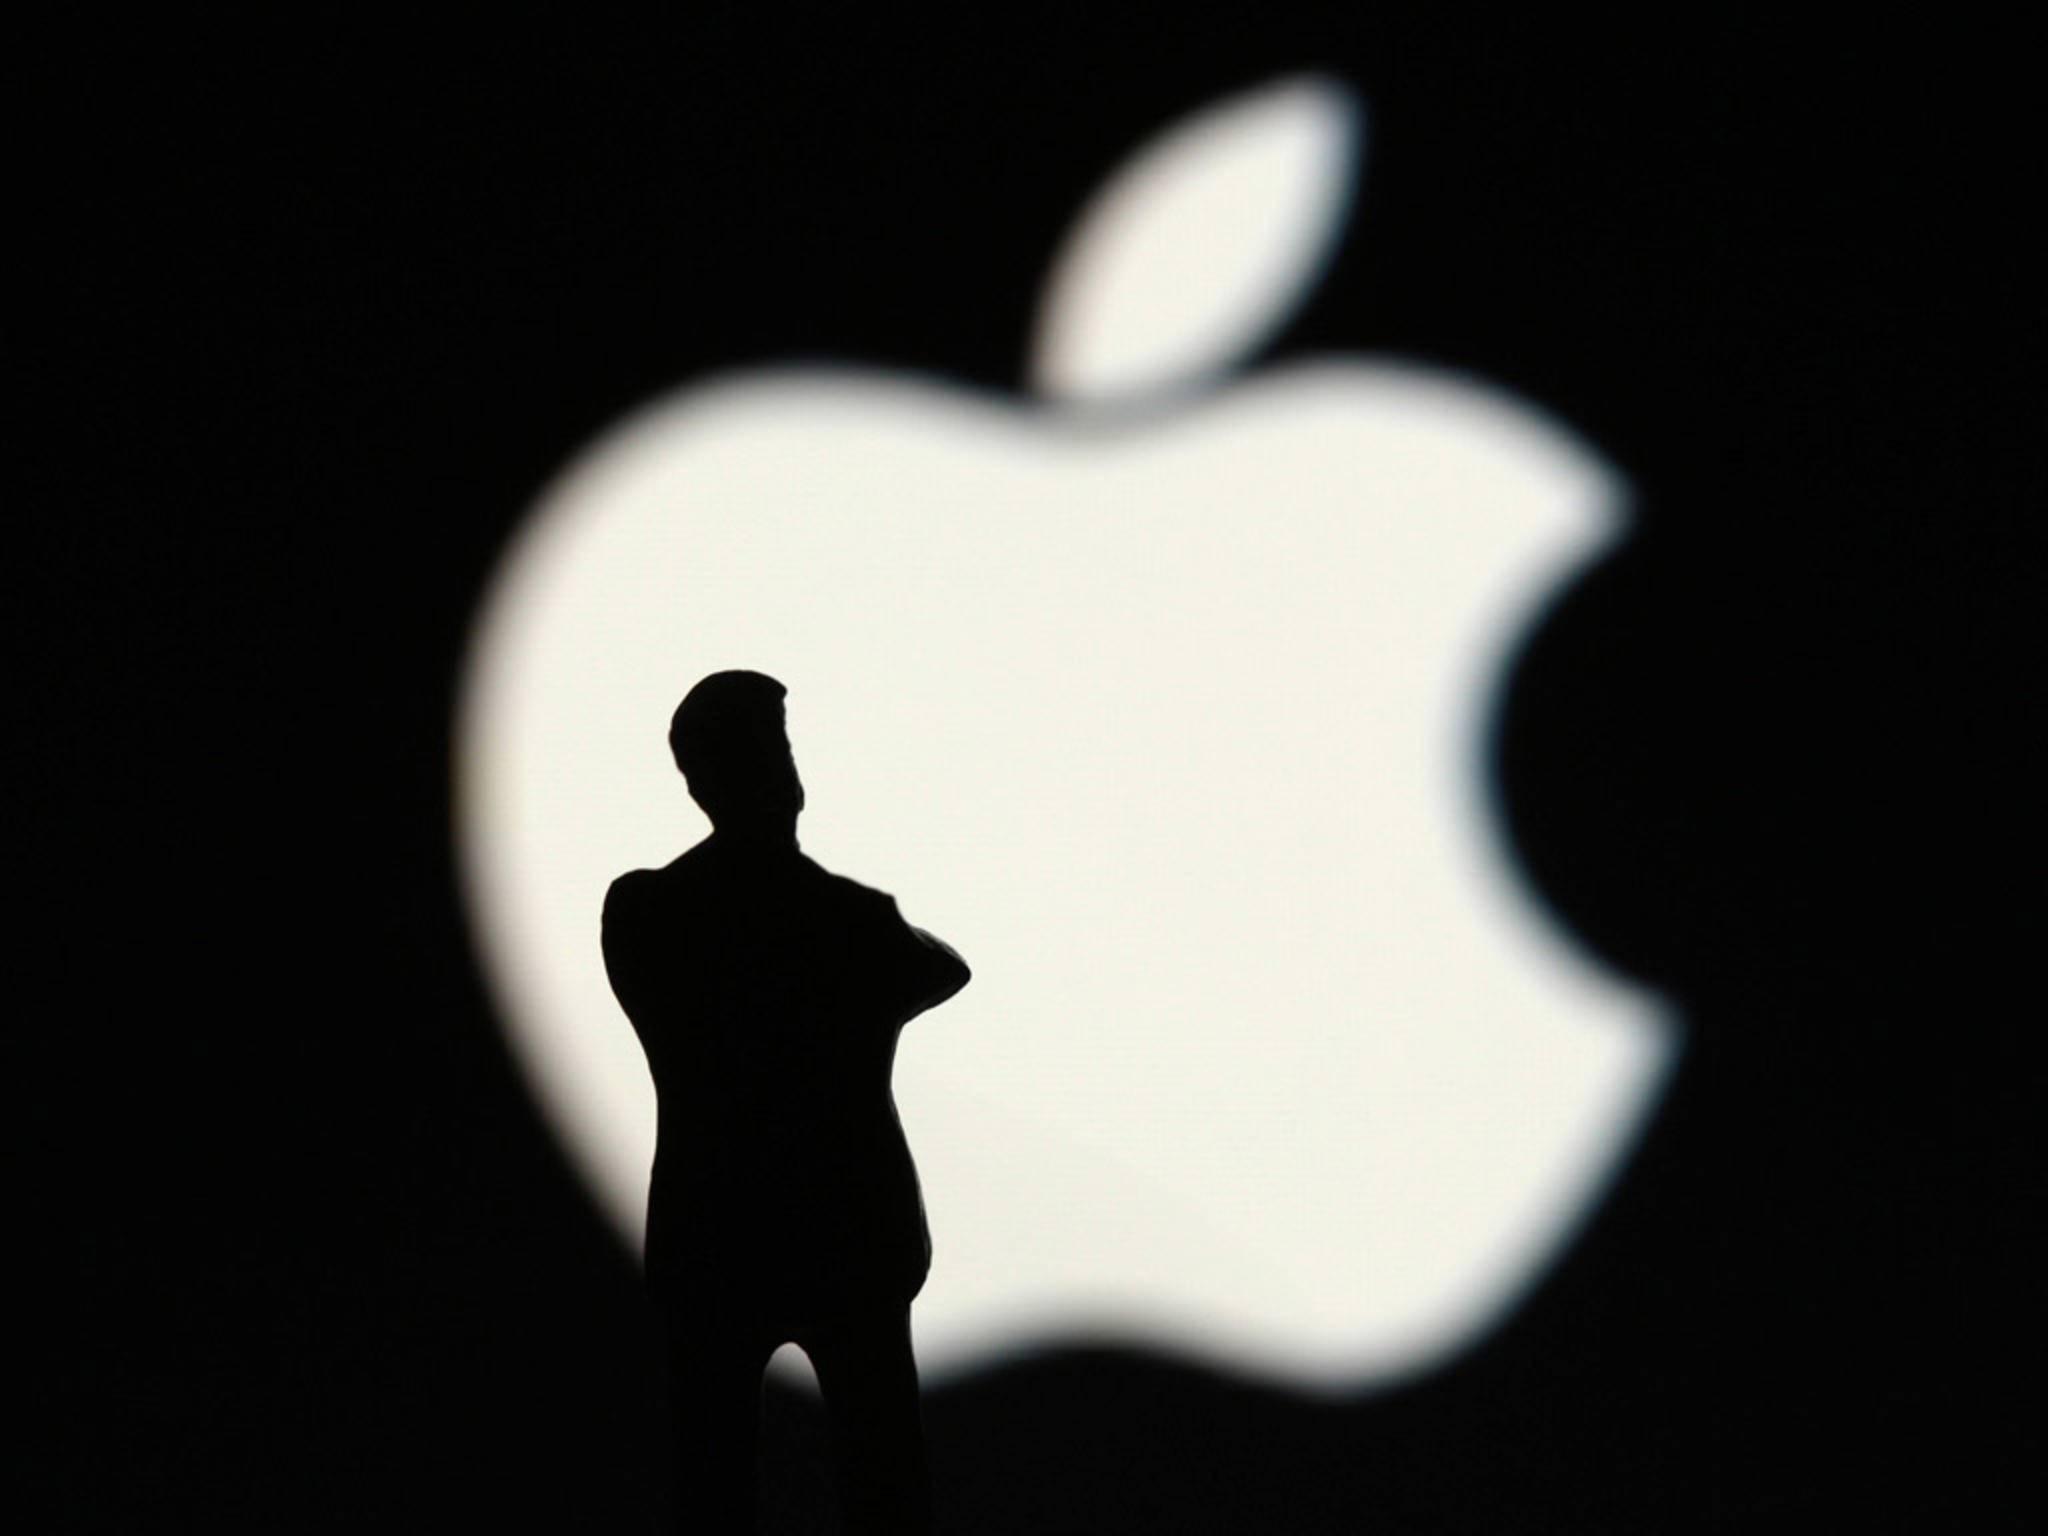 Apple feiert heute sein 40-jähriges Jubiläum.